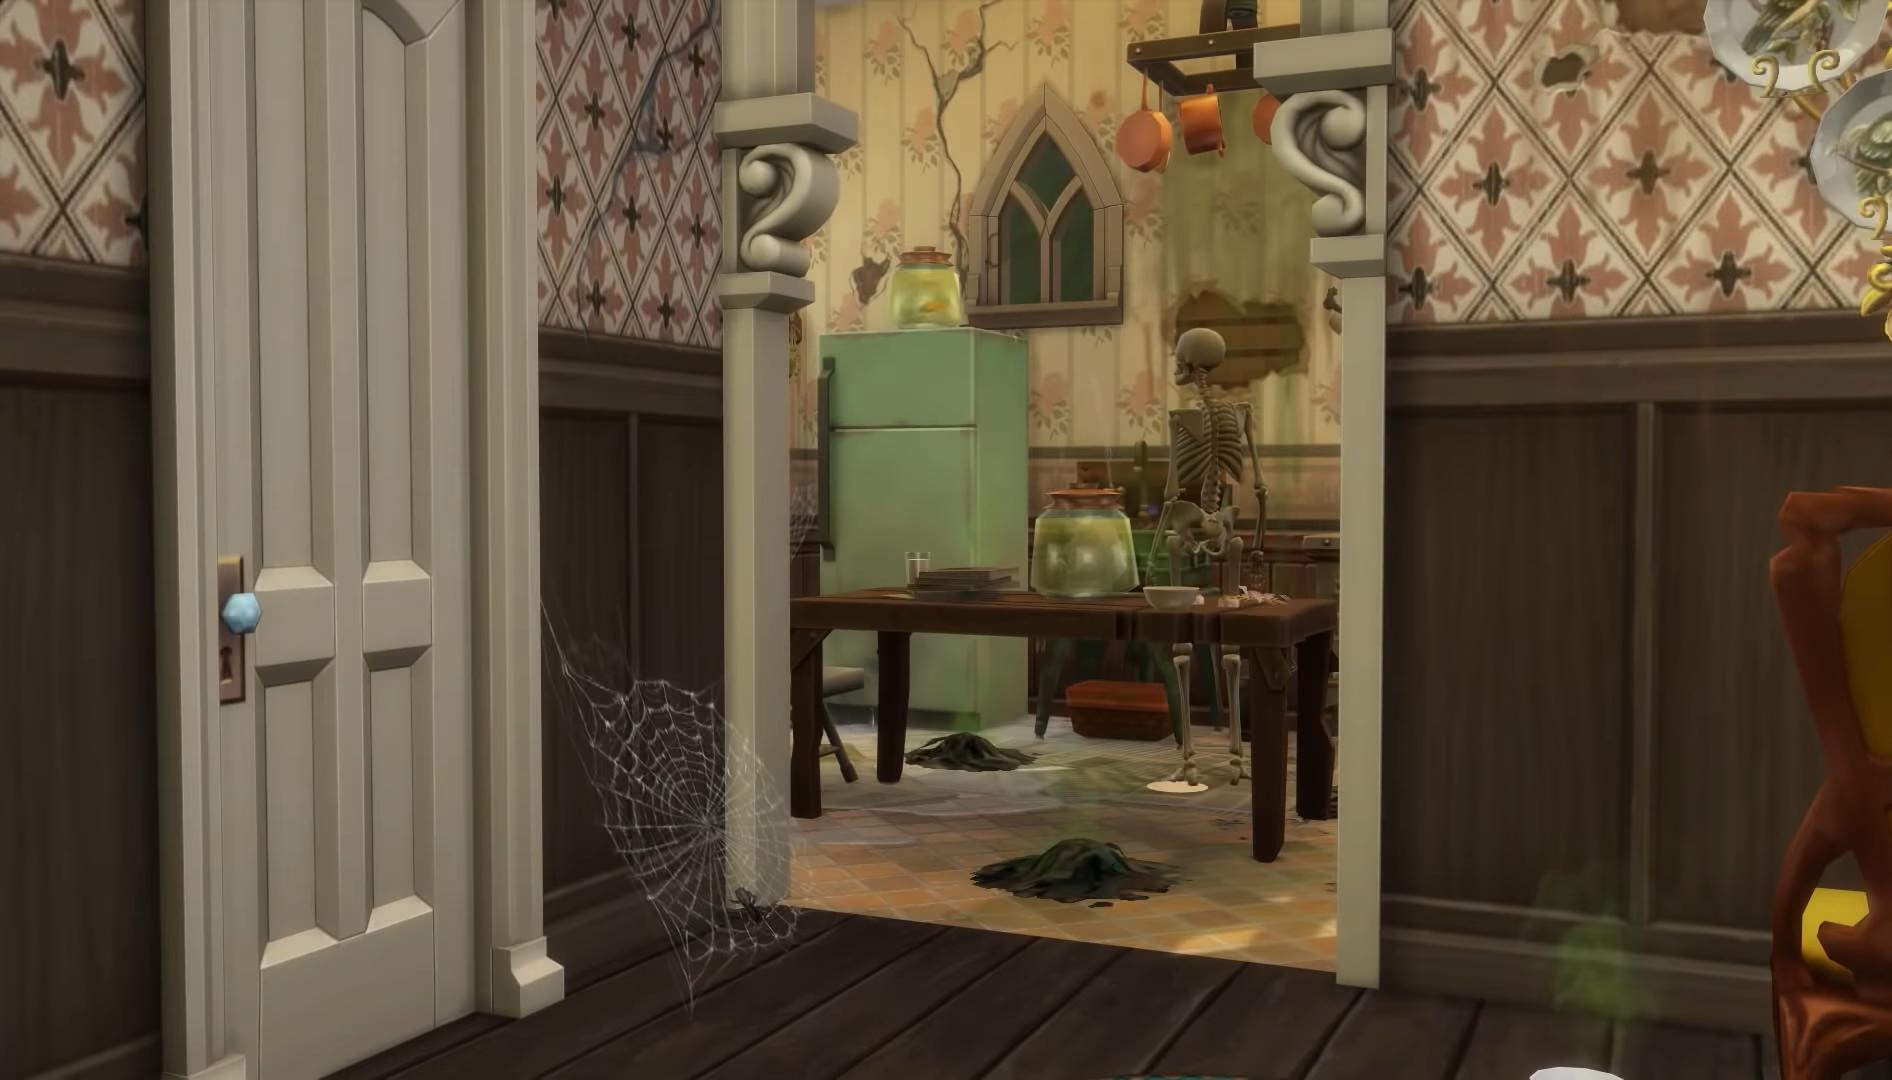 Les Sims Spark'd Screenshot-2020-08-03-181053